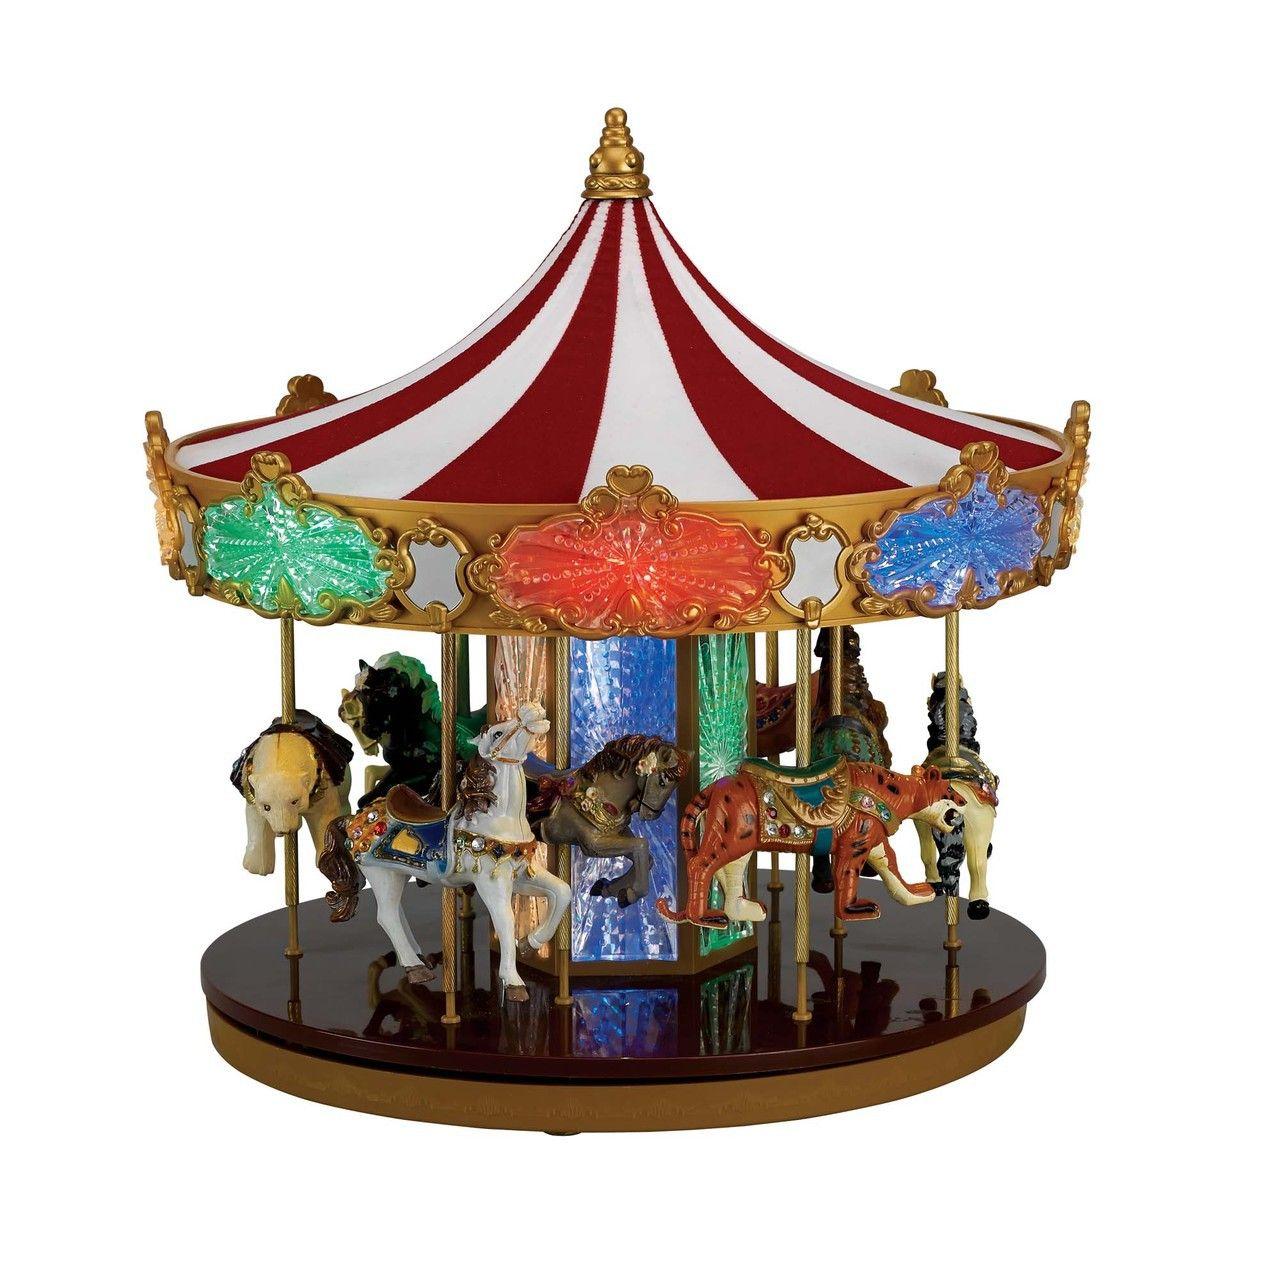 Mr Christmas Carousel.Pin By Nicole Mathews On Christmas Mr Christmas Carousel